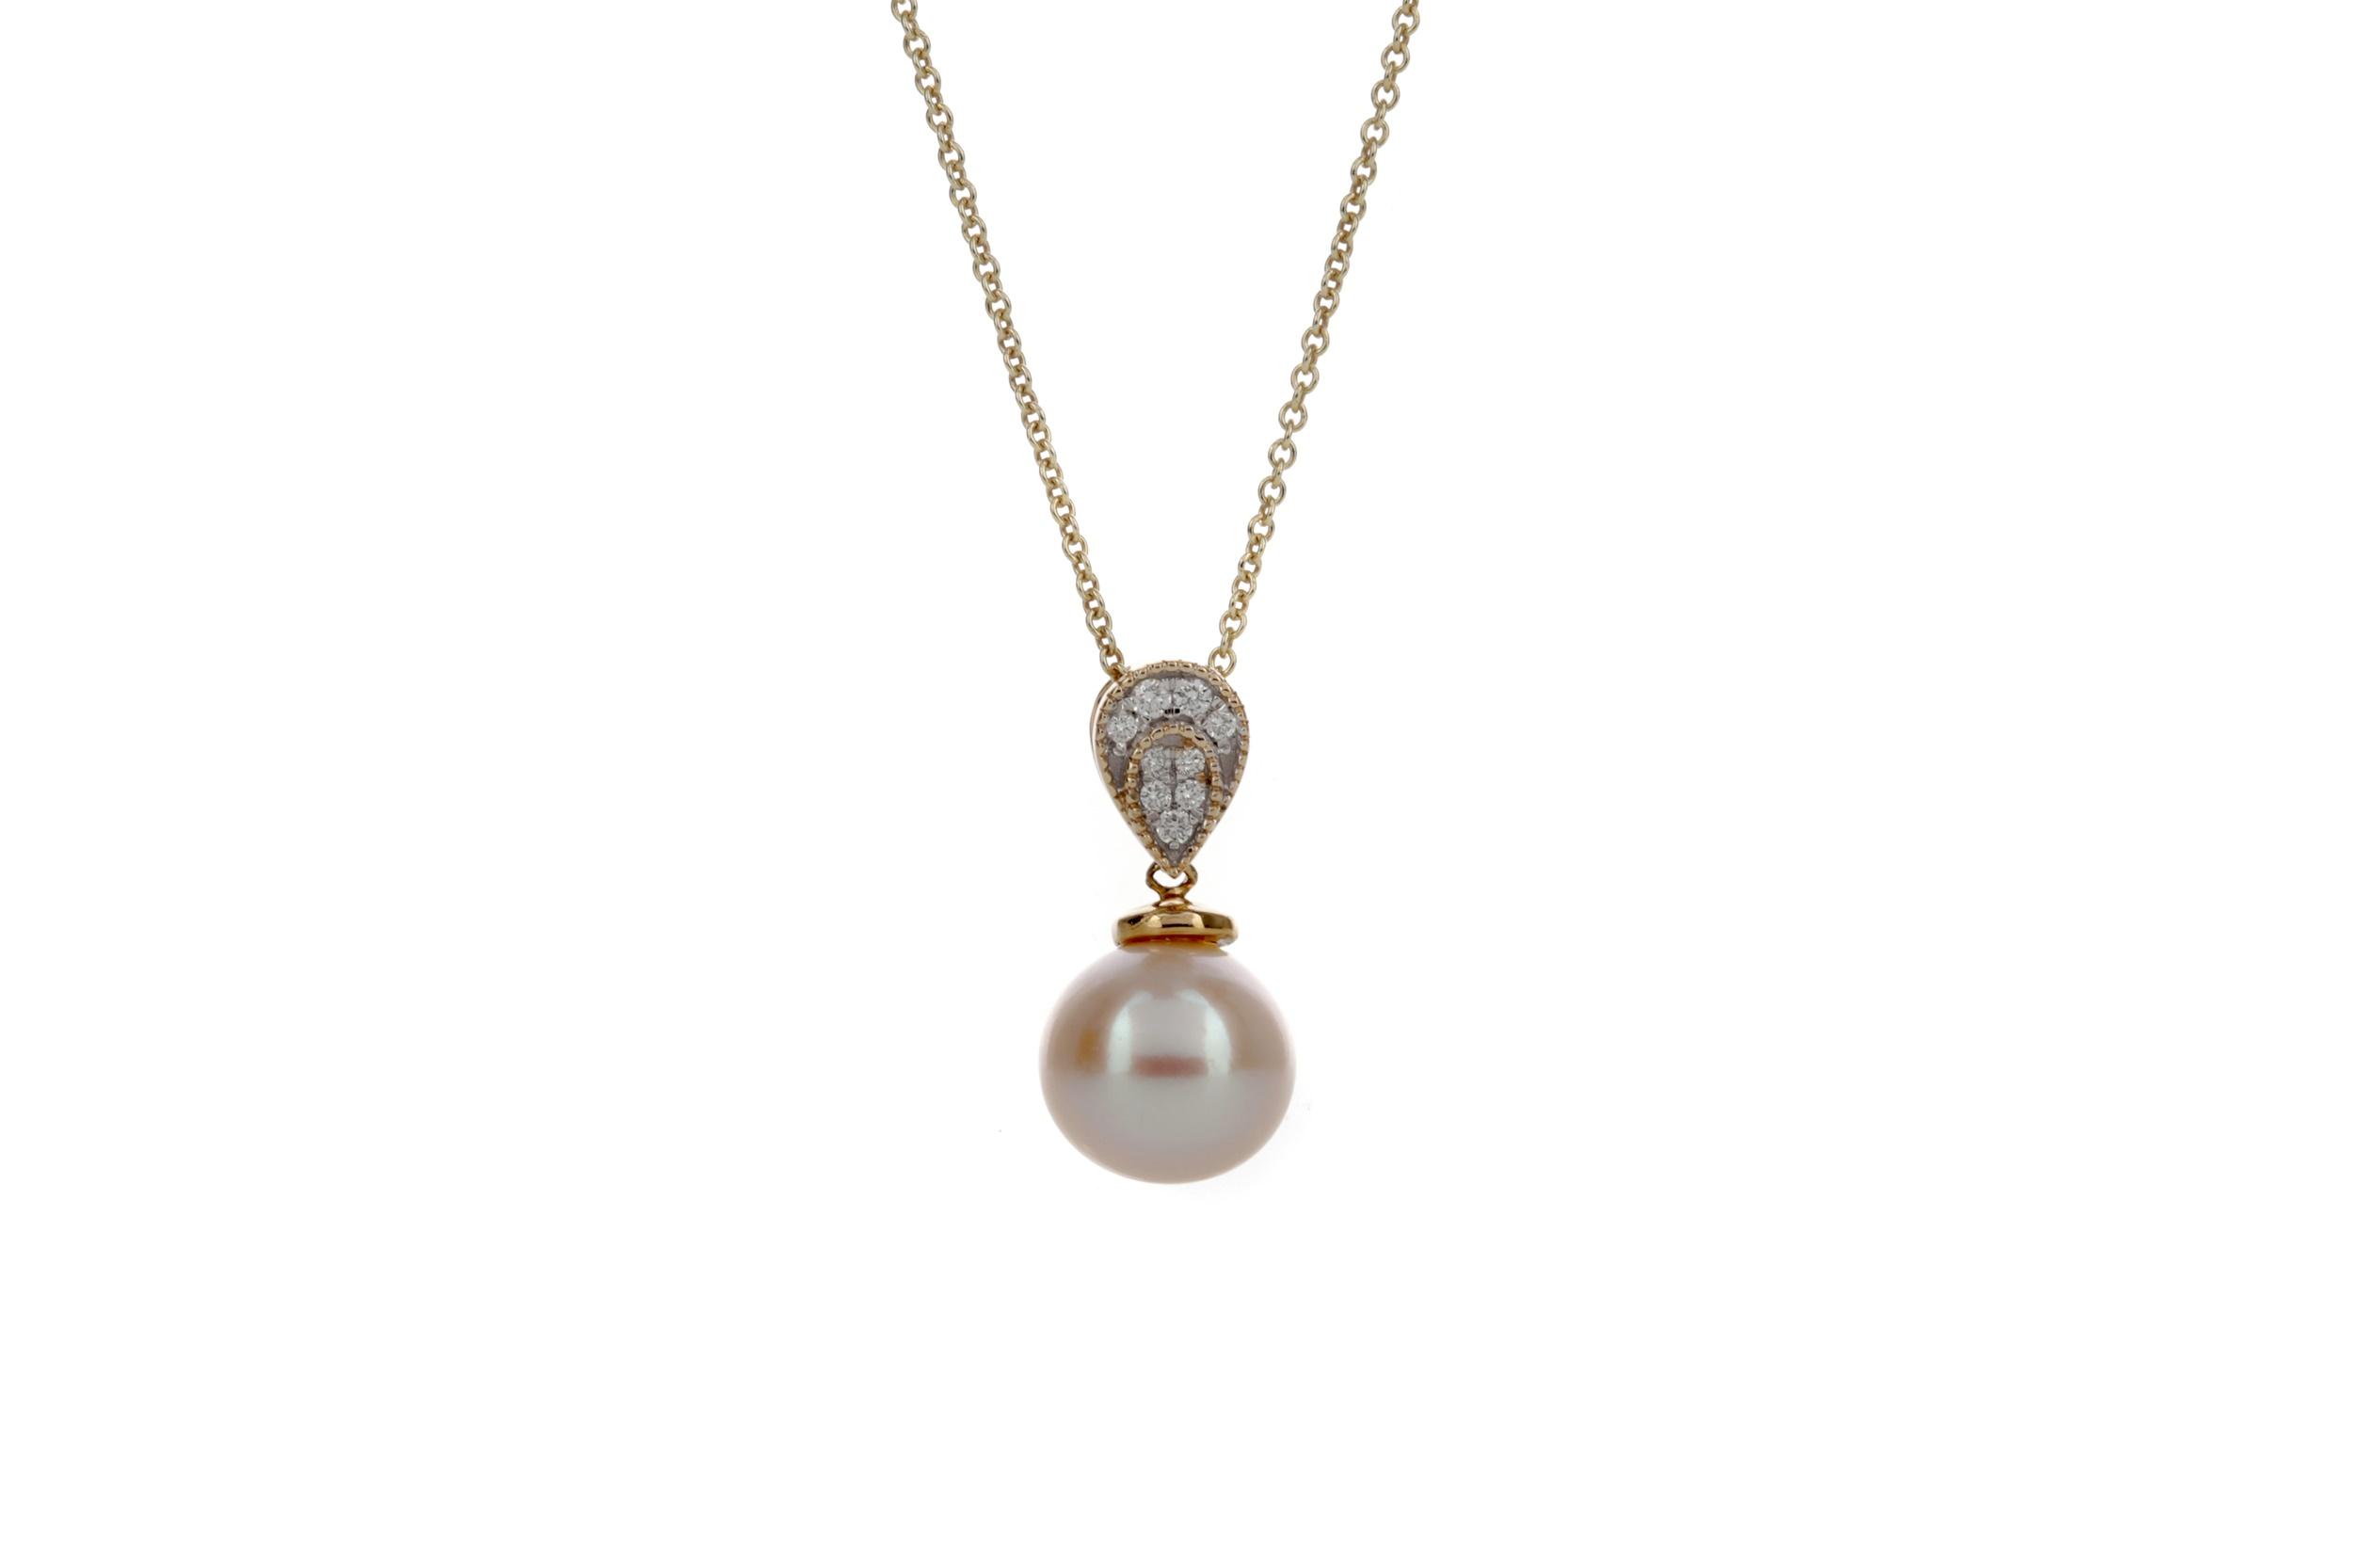 A PEARL AND DIAMOND PENDANT